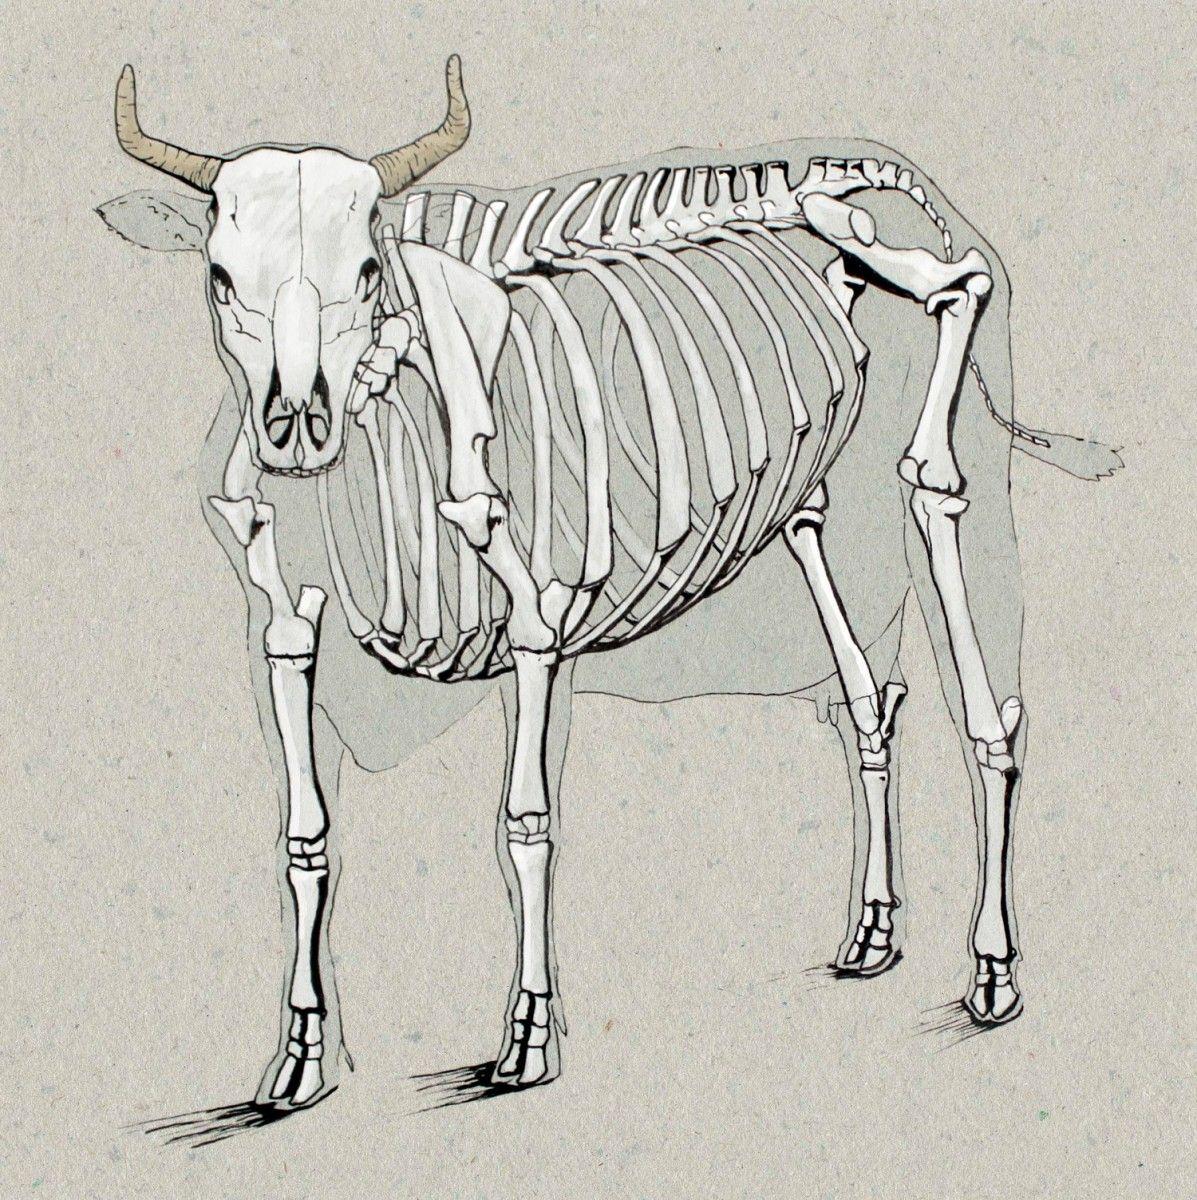 Cow Anatomy Drawing | Anatomy Drawings | Pinterest | Anatomy drawing ...